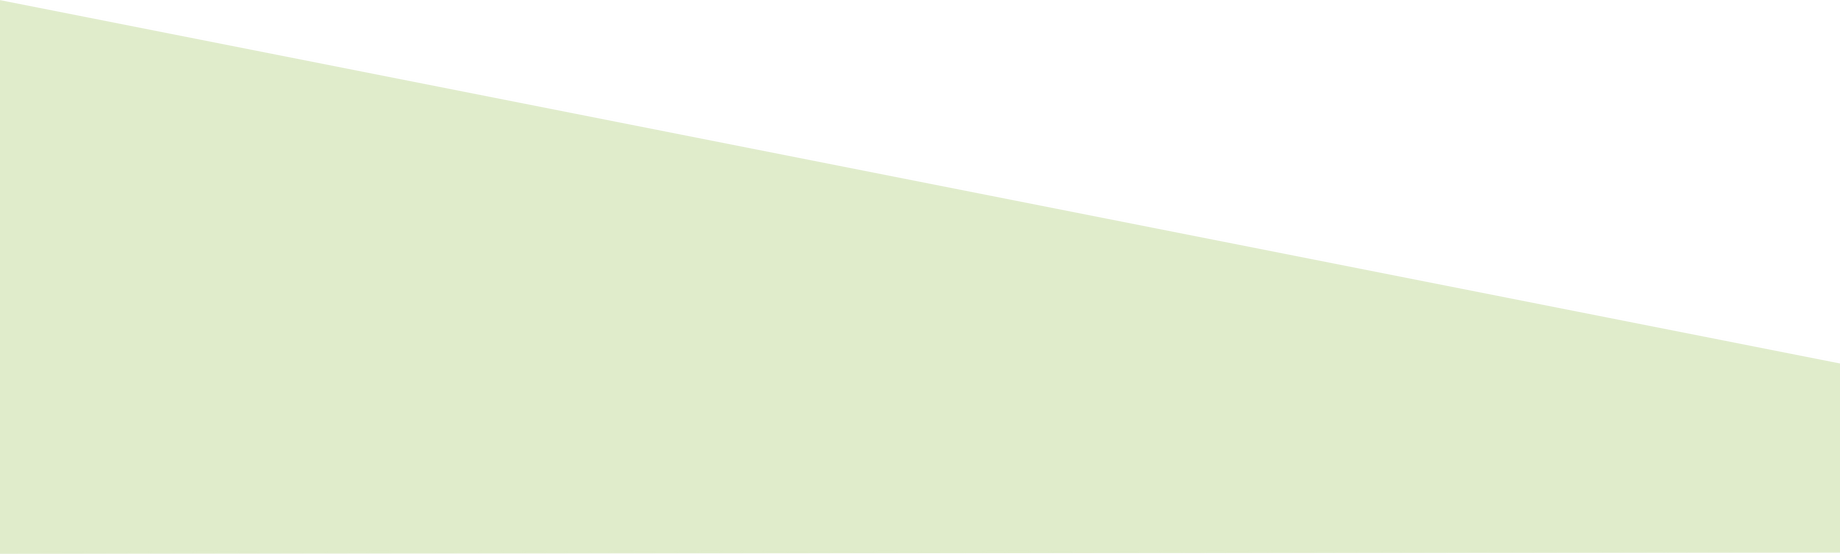 greenstrip2.png